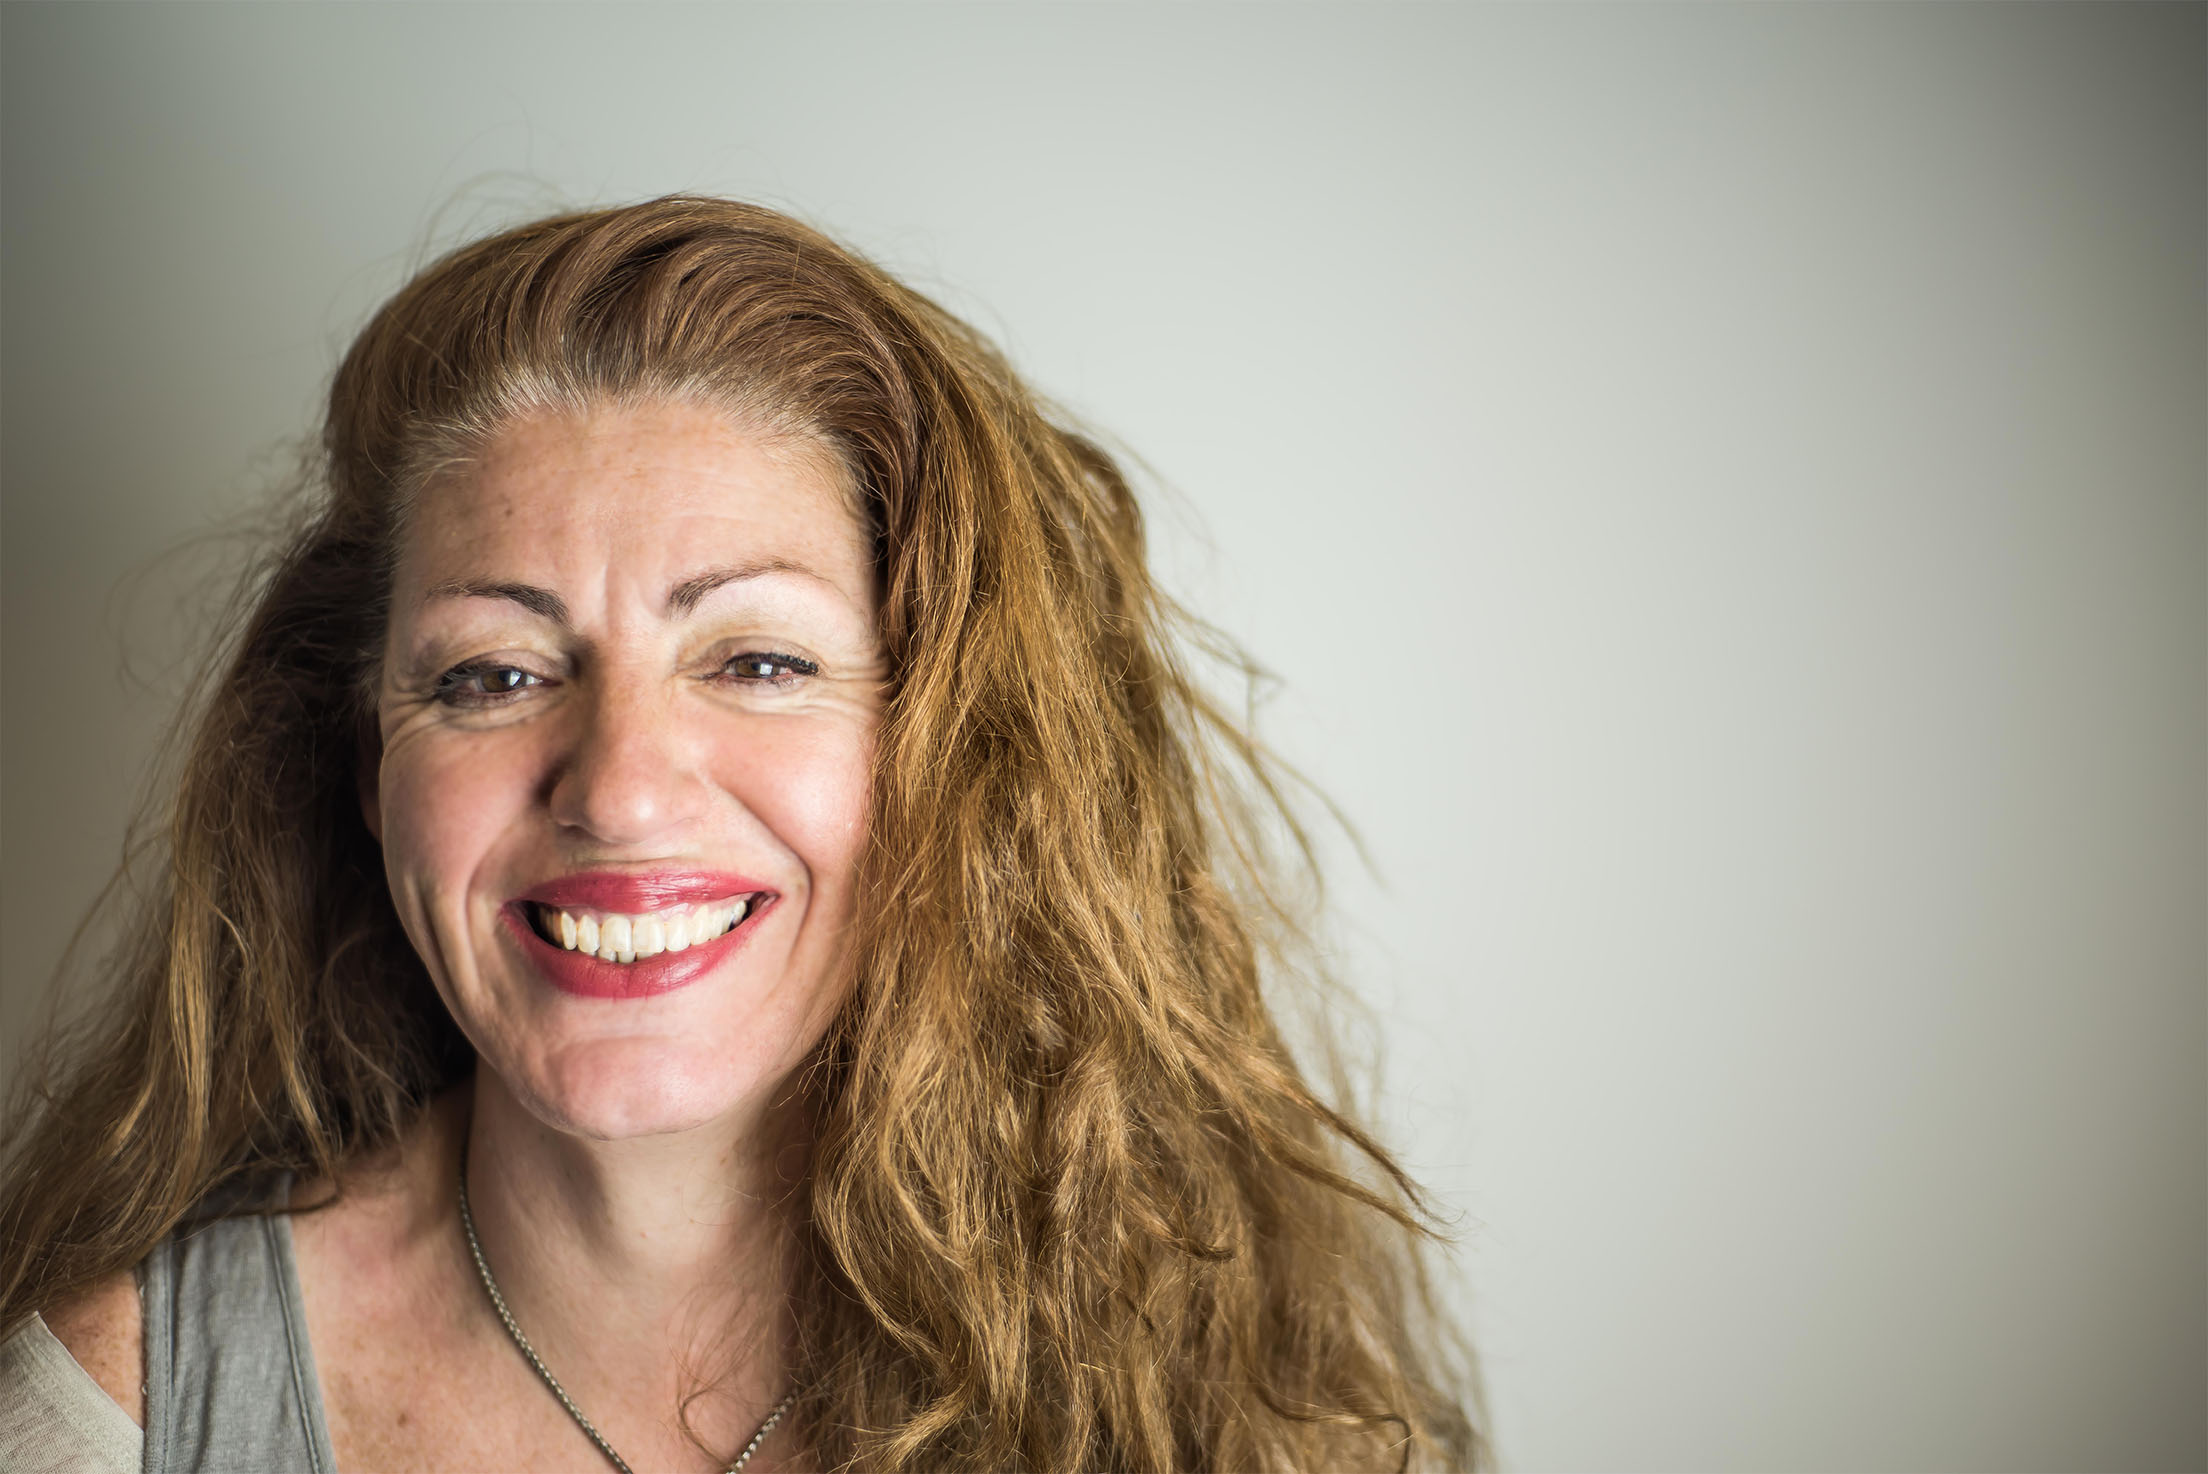 Anna Torreggiani cultura e salute